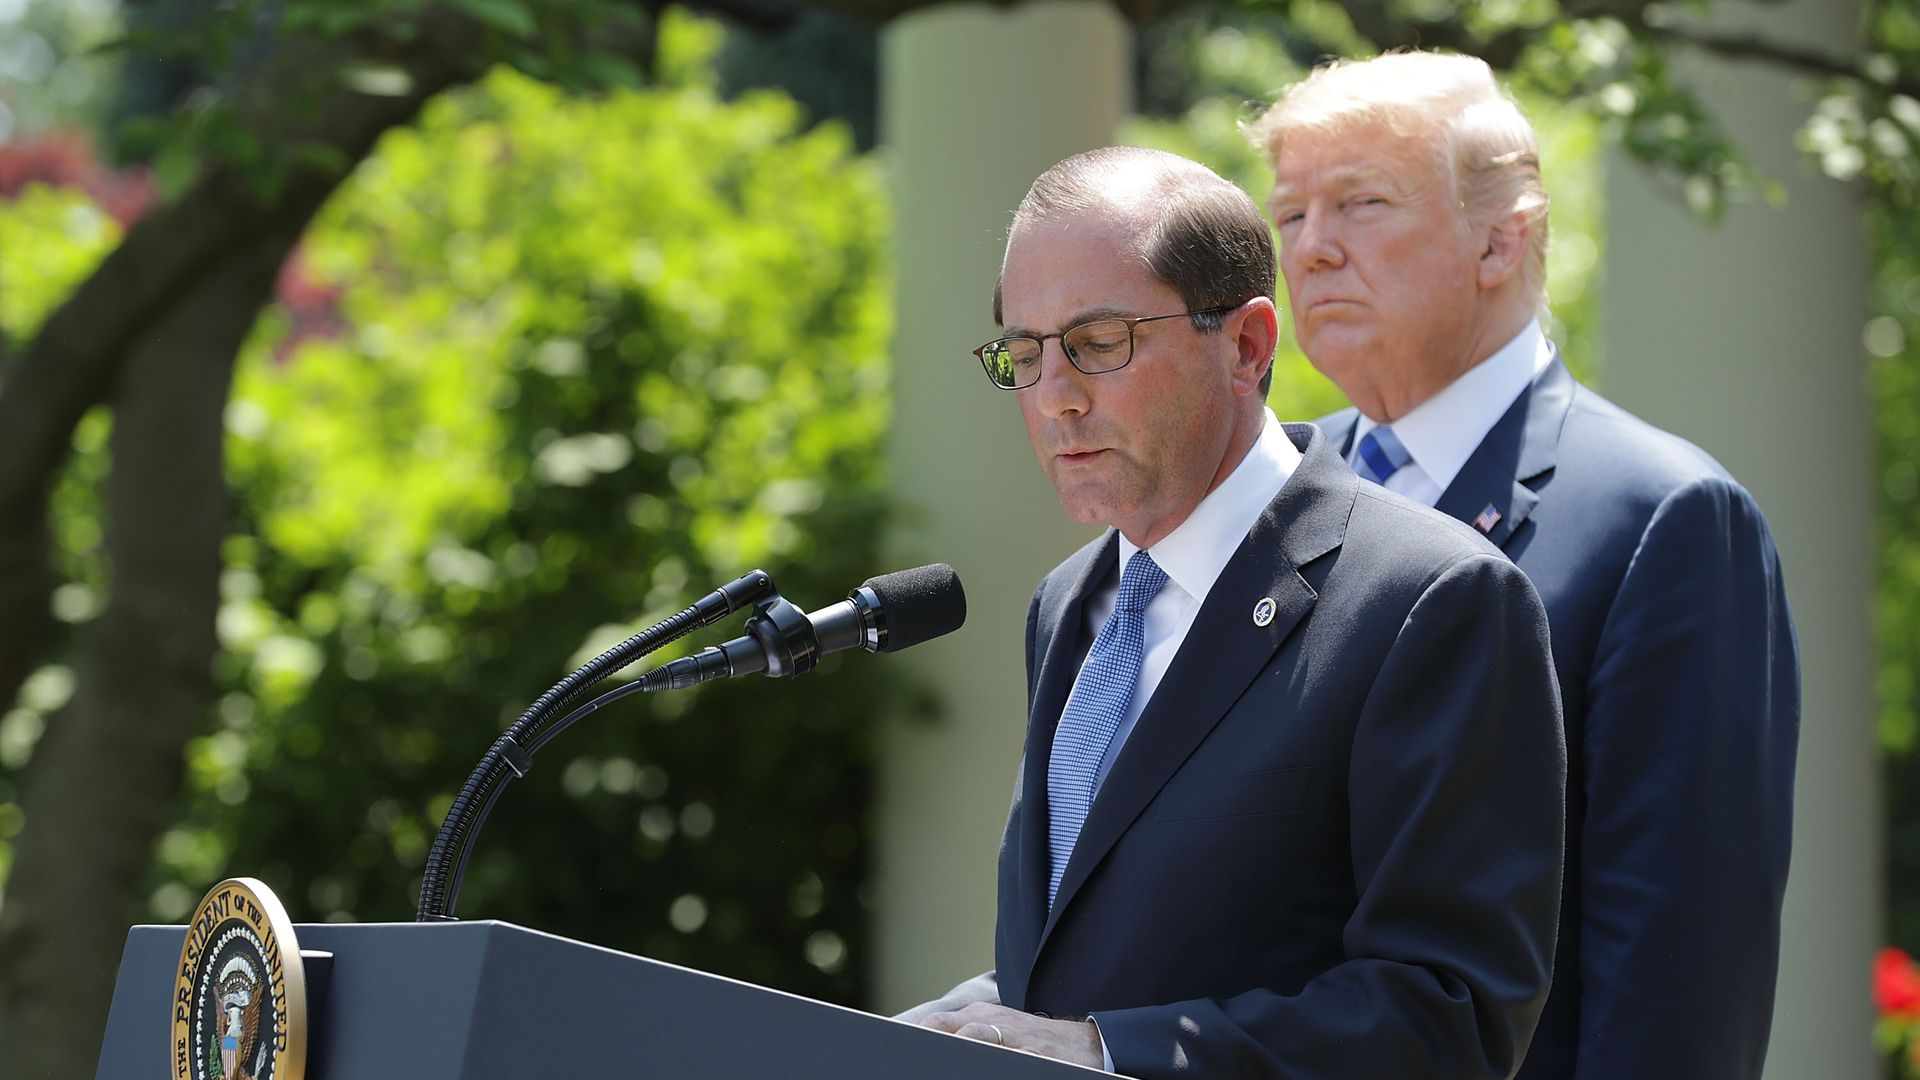 HHS Secretary Alex Azar and President Trump